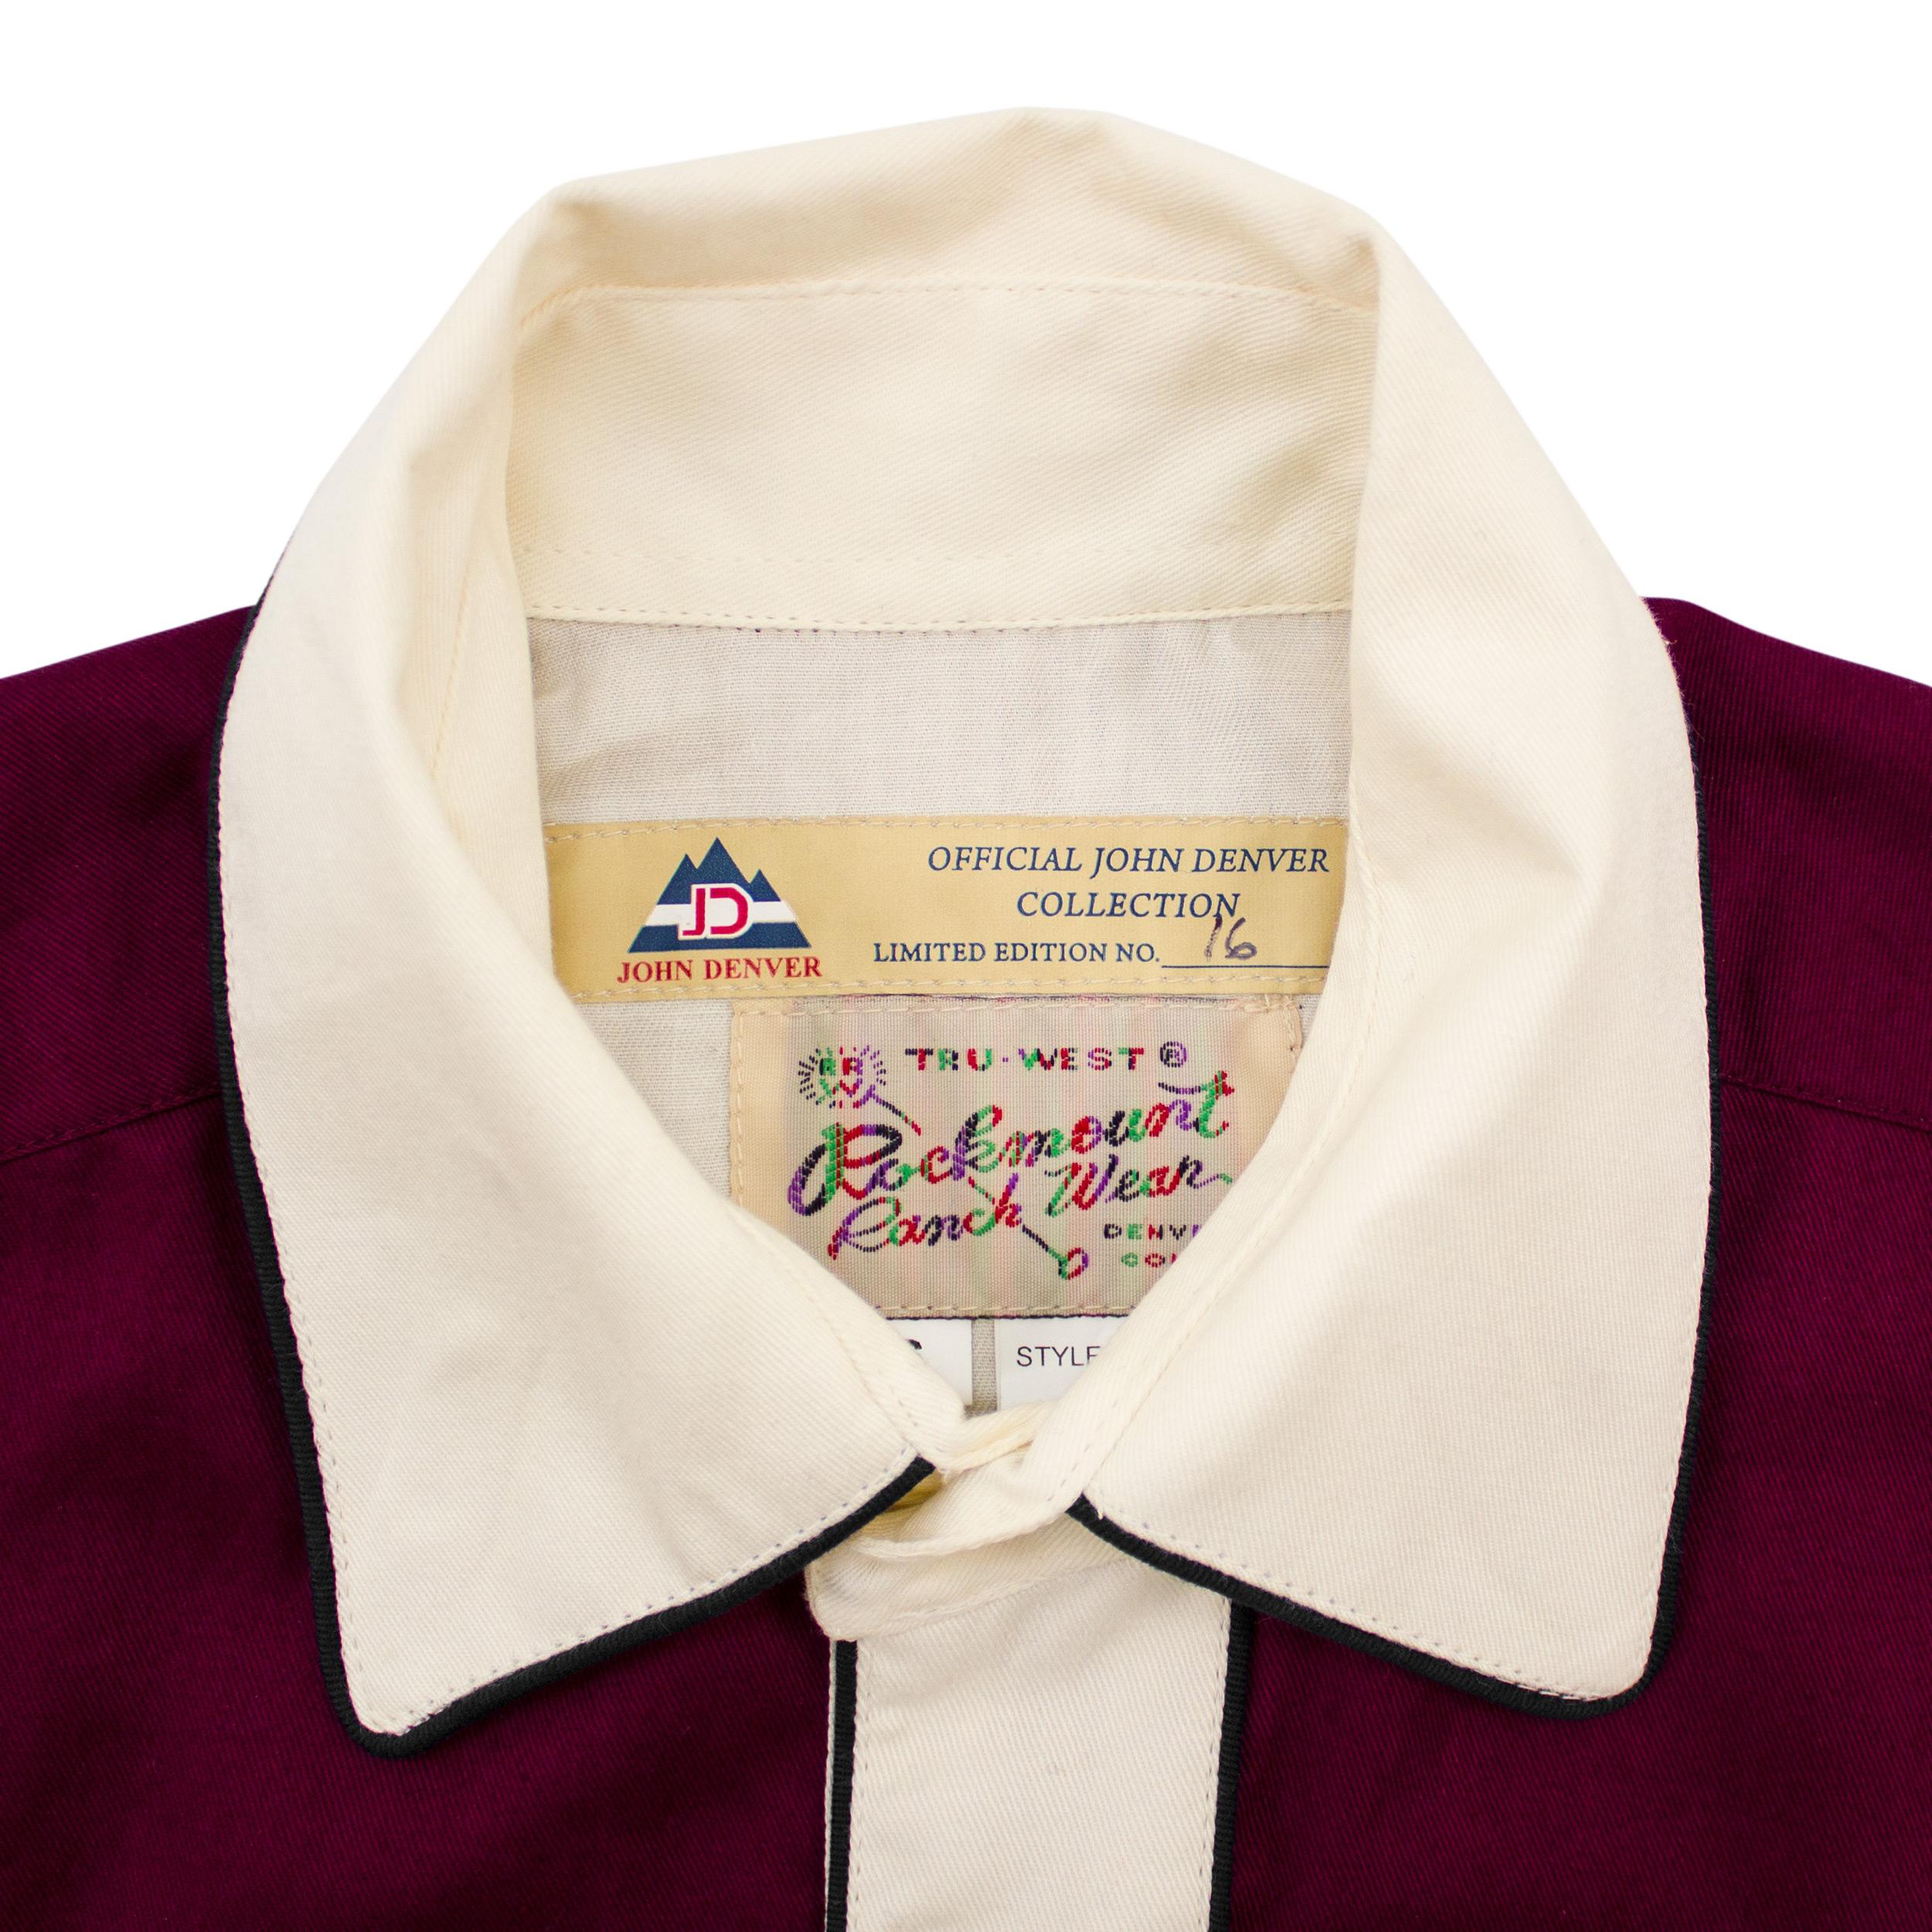 Rockmount Ranch Wear for John Denver